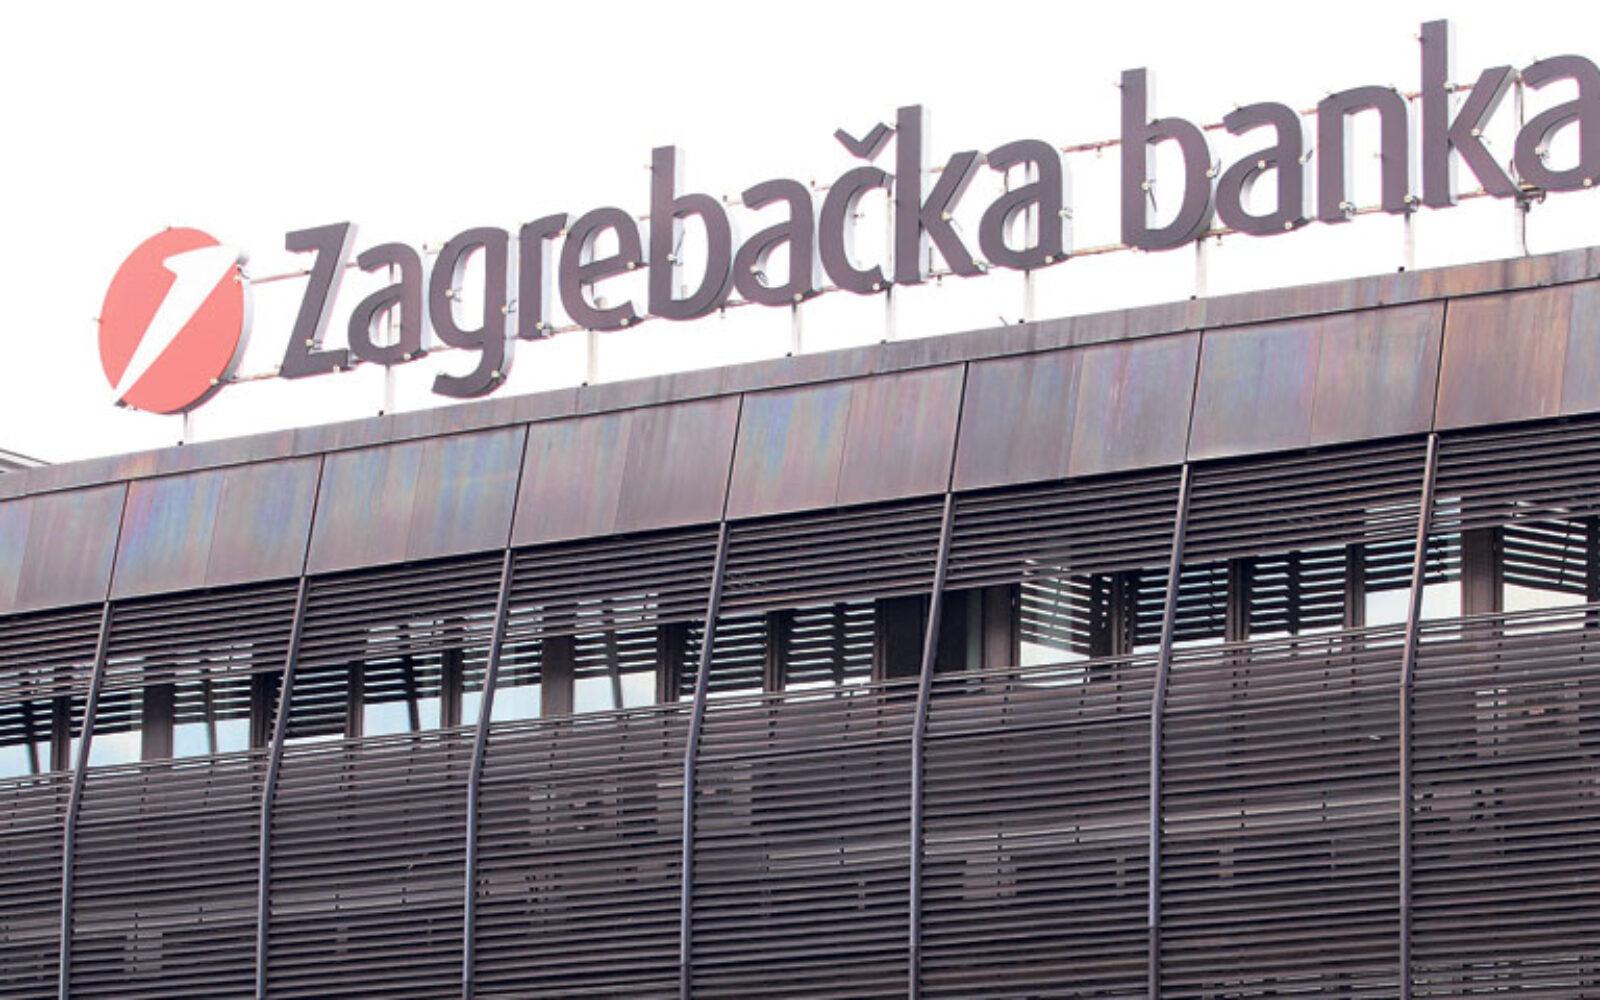 Zabi 93 11 Unicredit Banke Mostar Poslovni Dnevnik